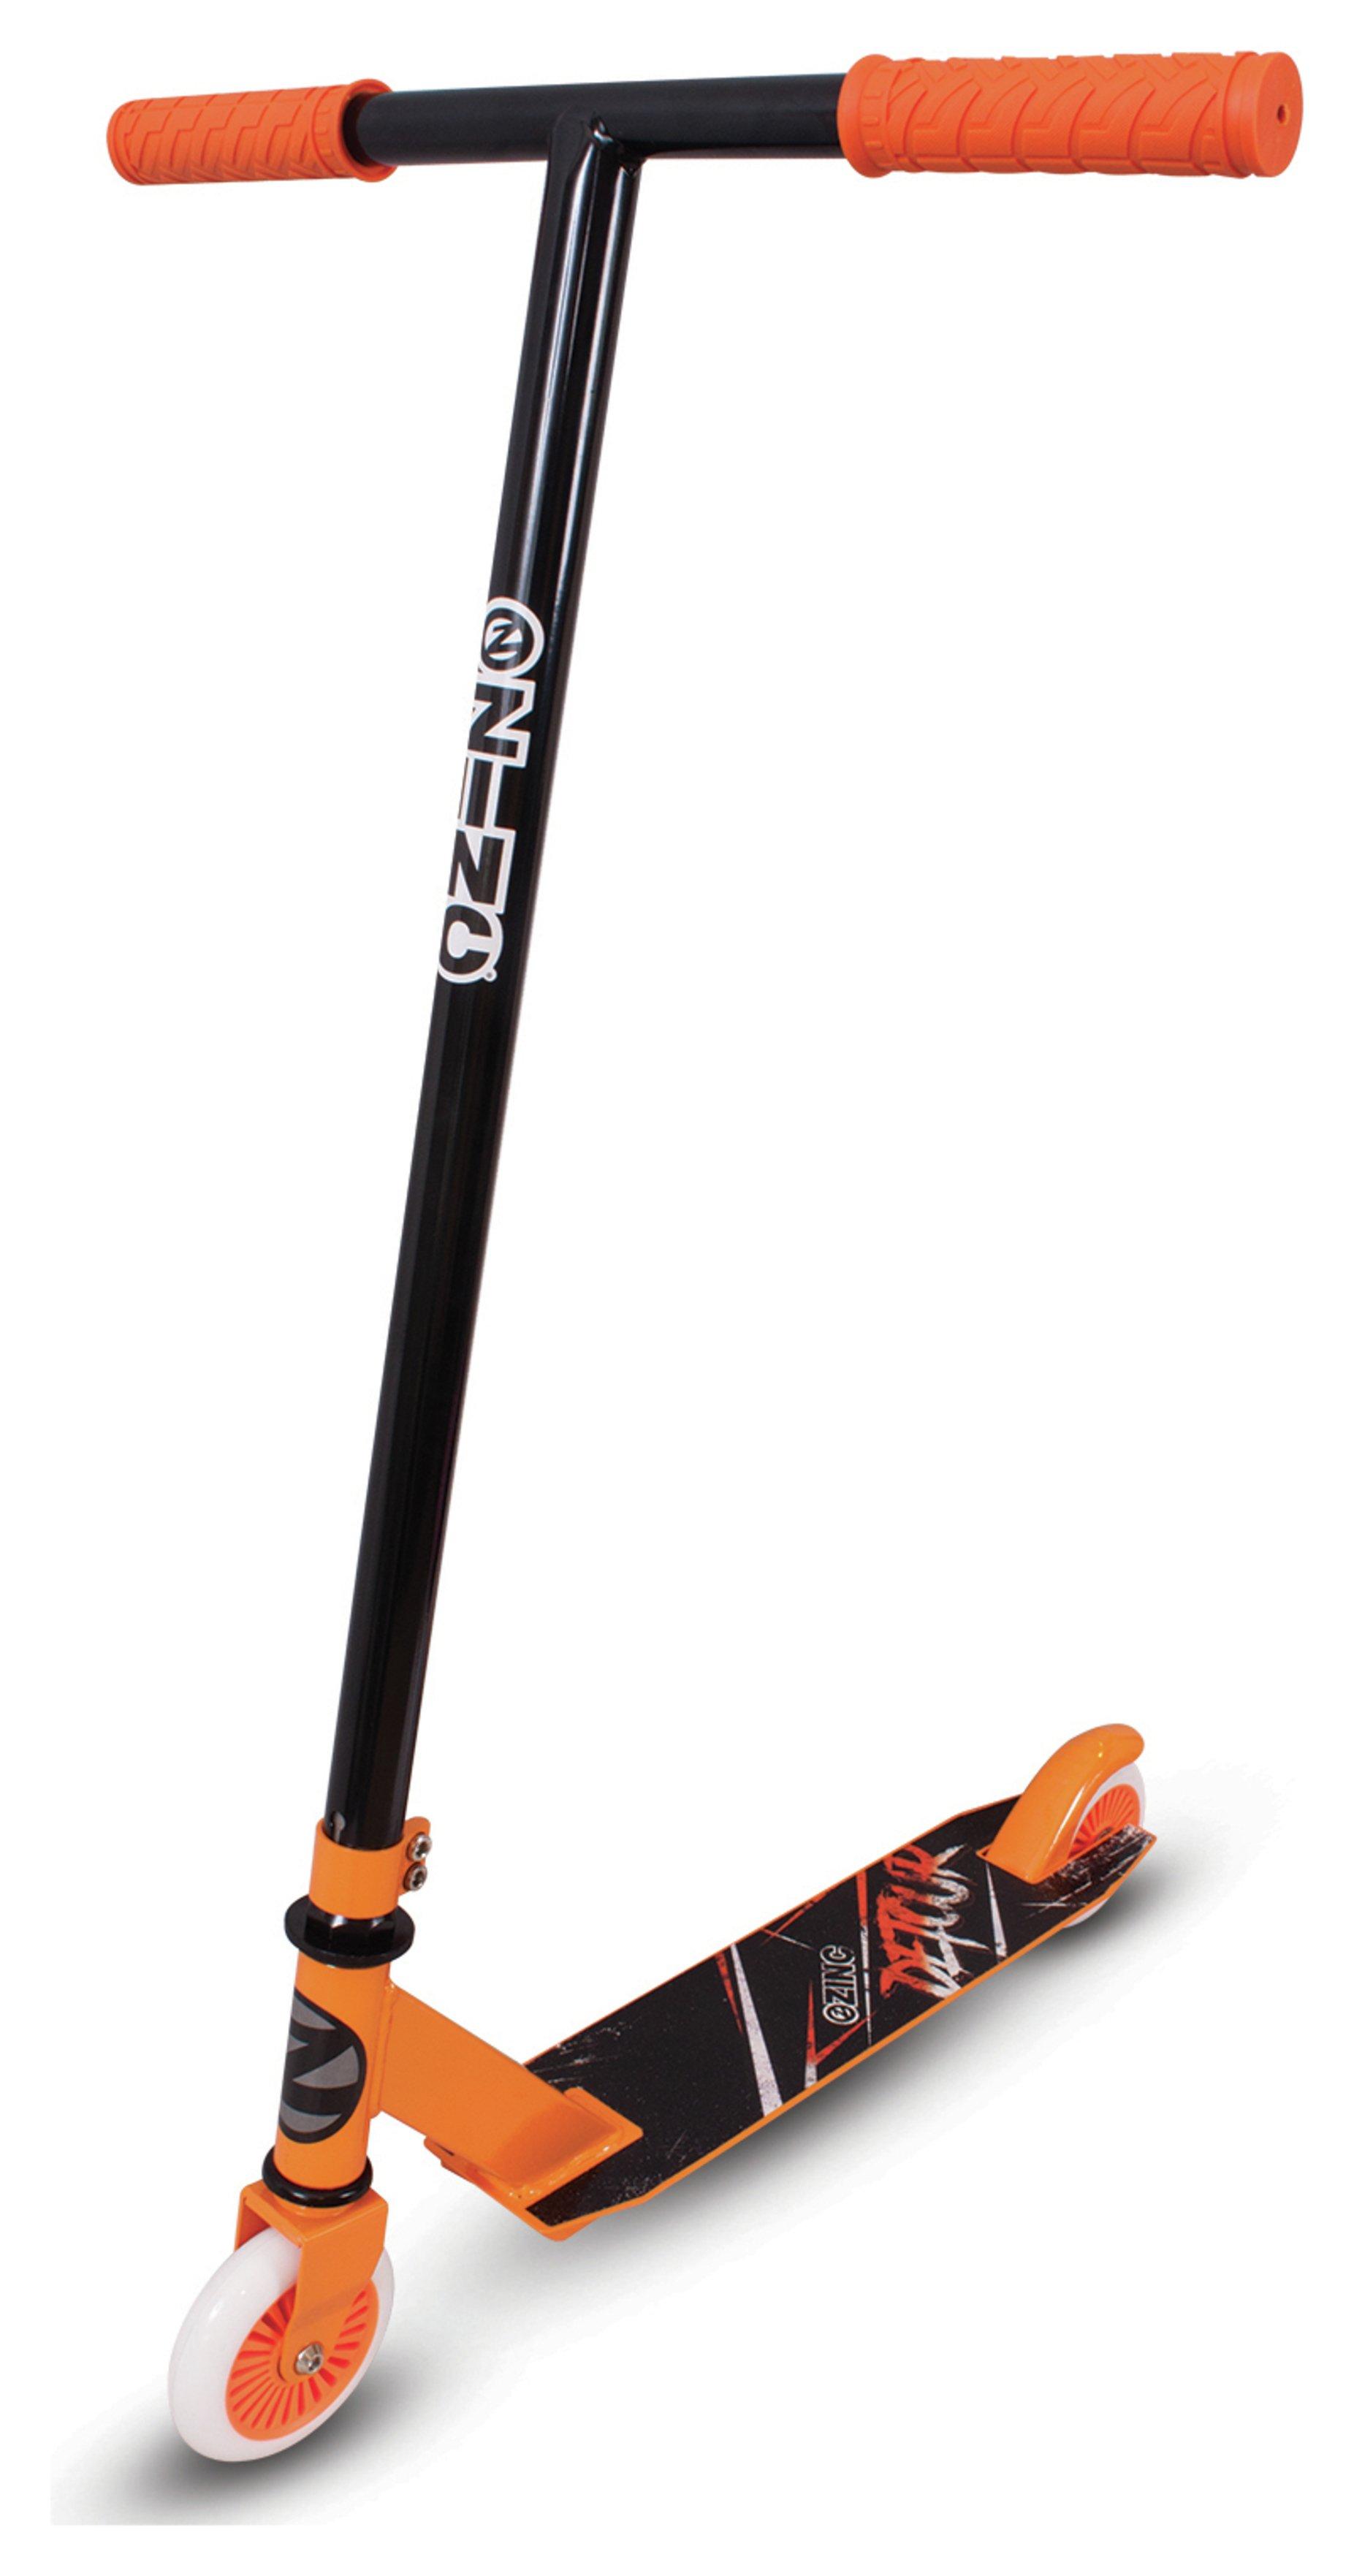 Zinc Detour Stunt Scooter - Black and Orange